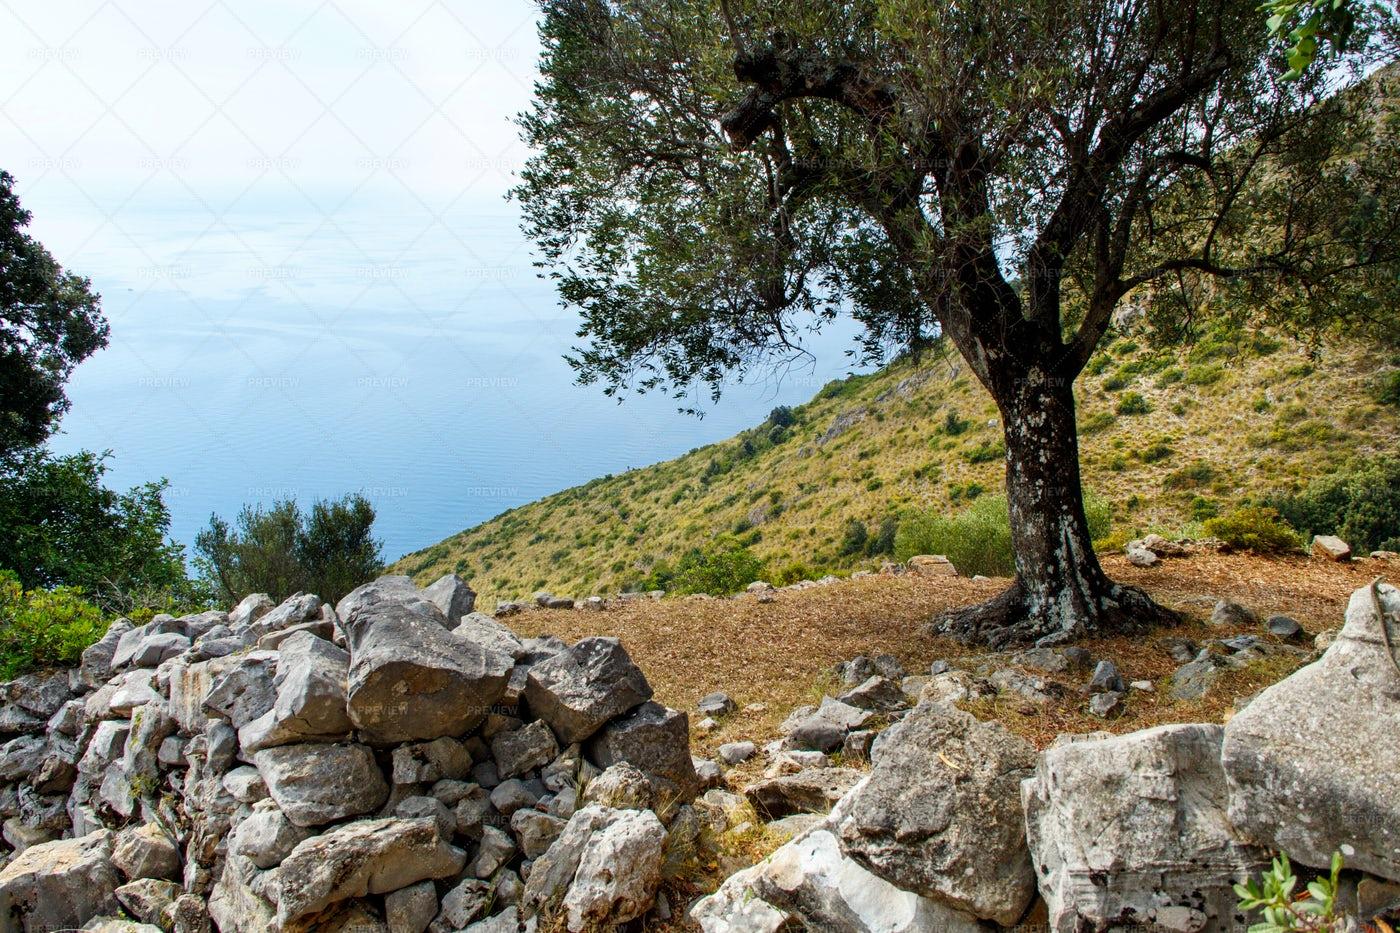 Hiking Trail, Costa Di Masseta, Italy: Stock Photos